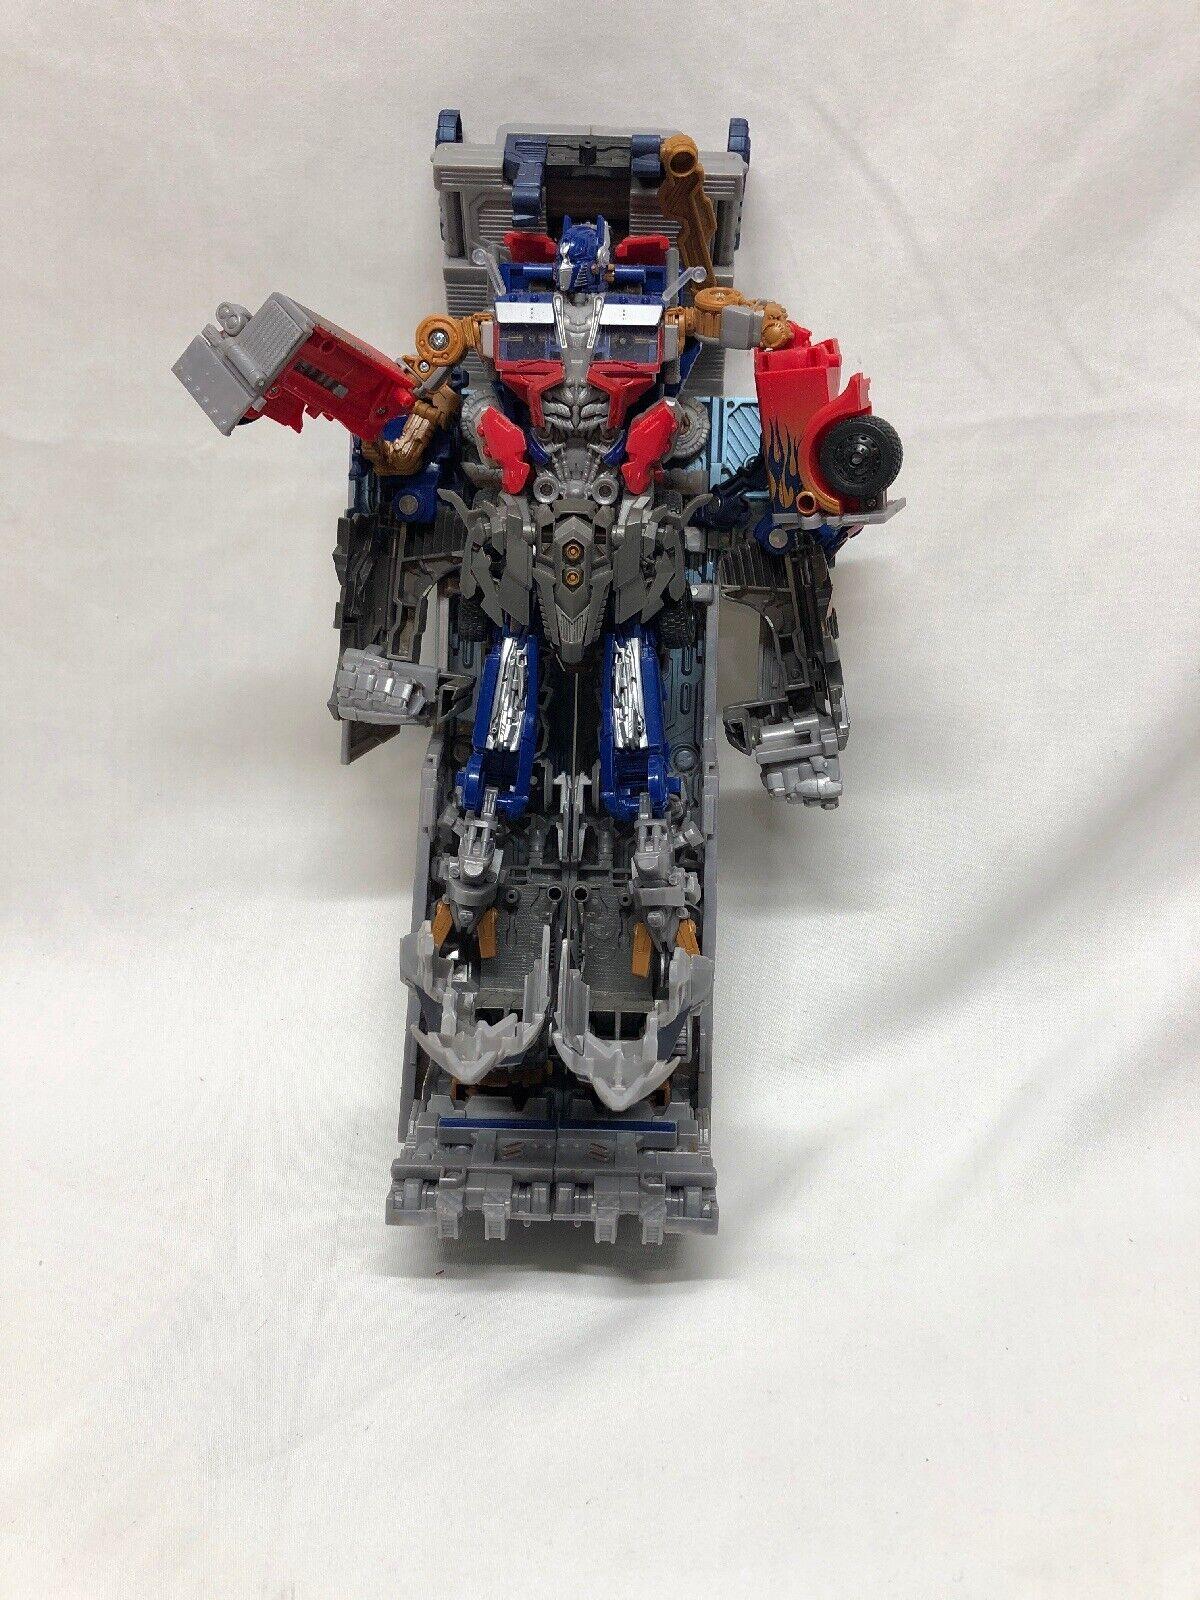 2011 Hasbro Transformers Dark of the Moon Mechtech Ultimate Optimus Prime